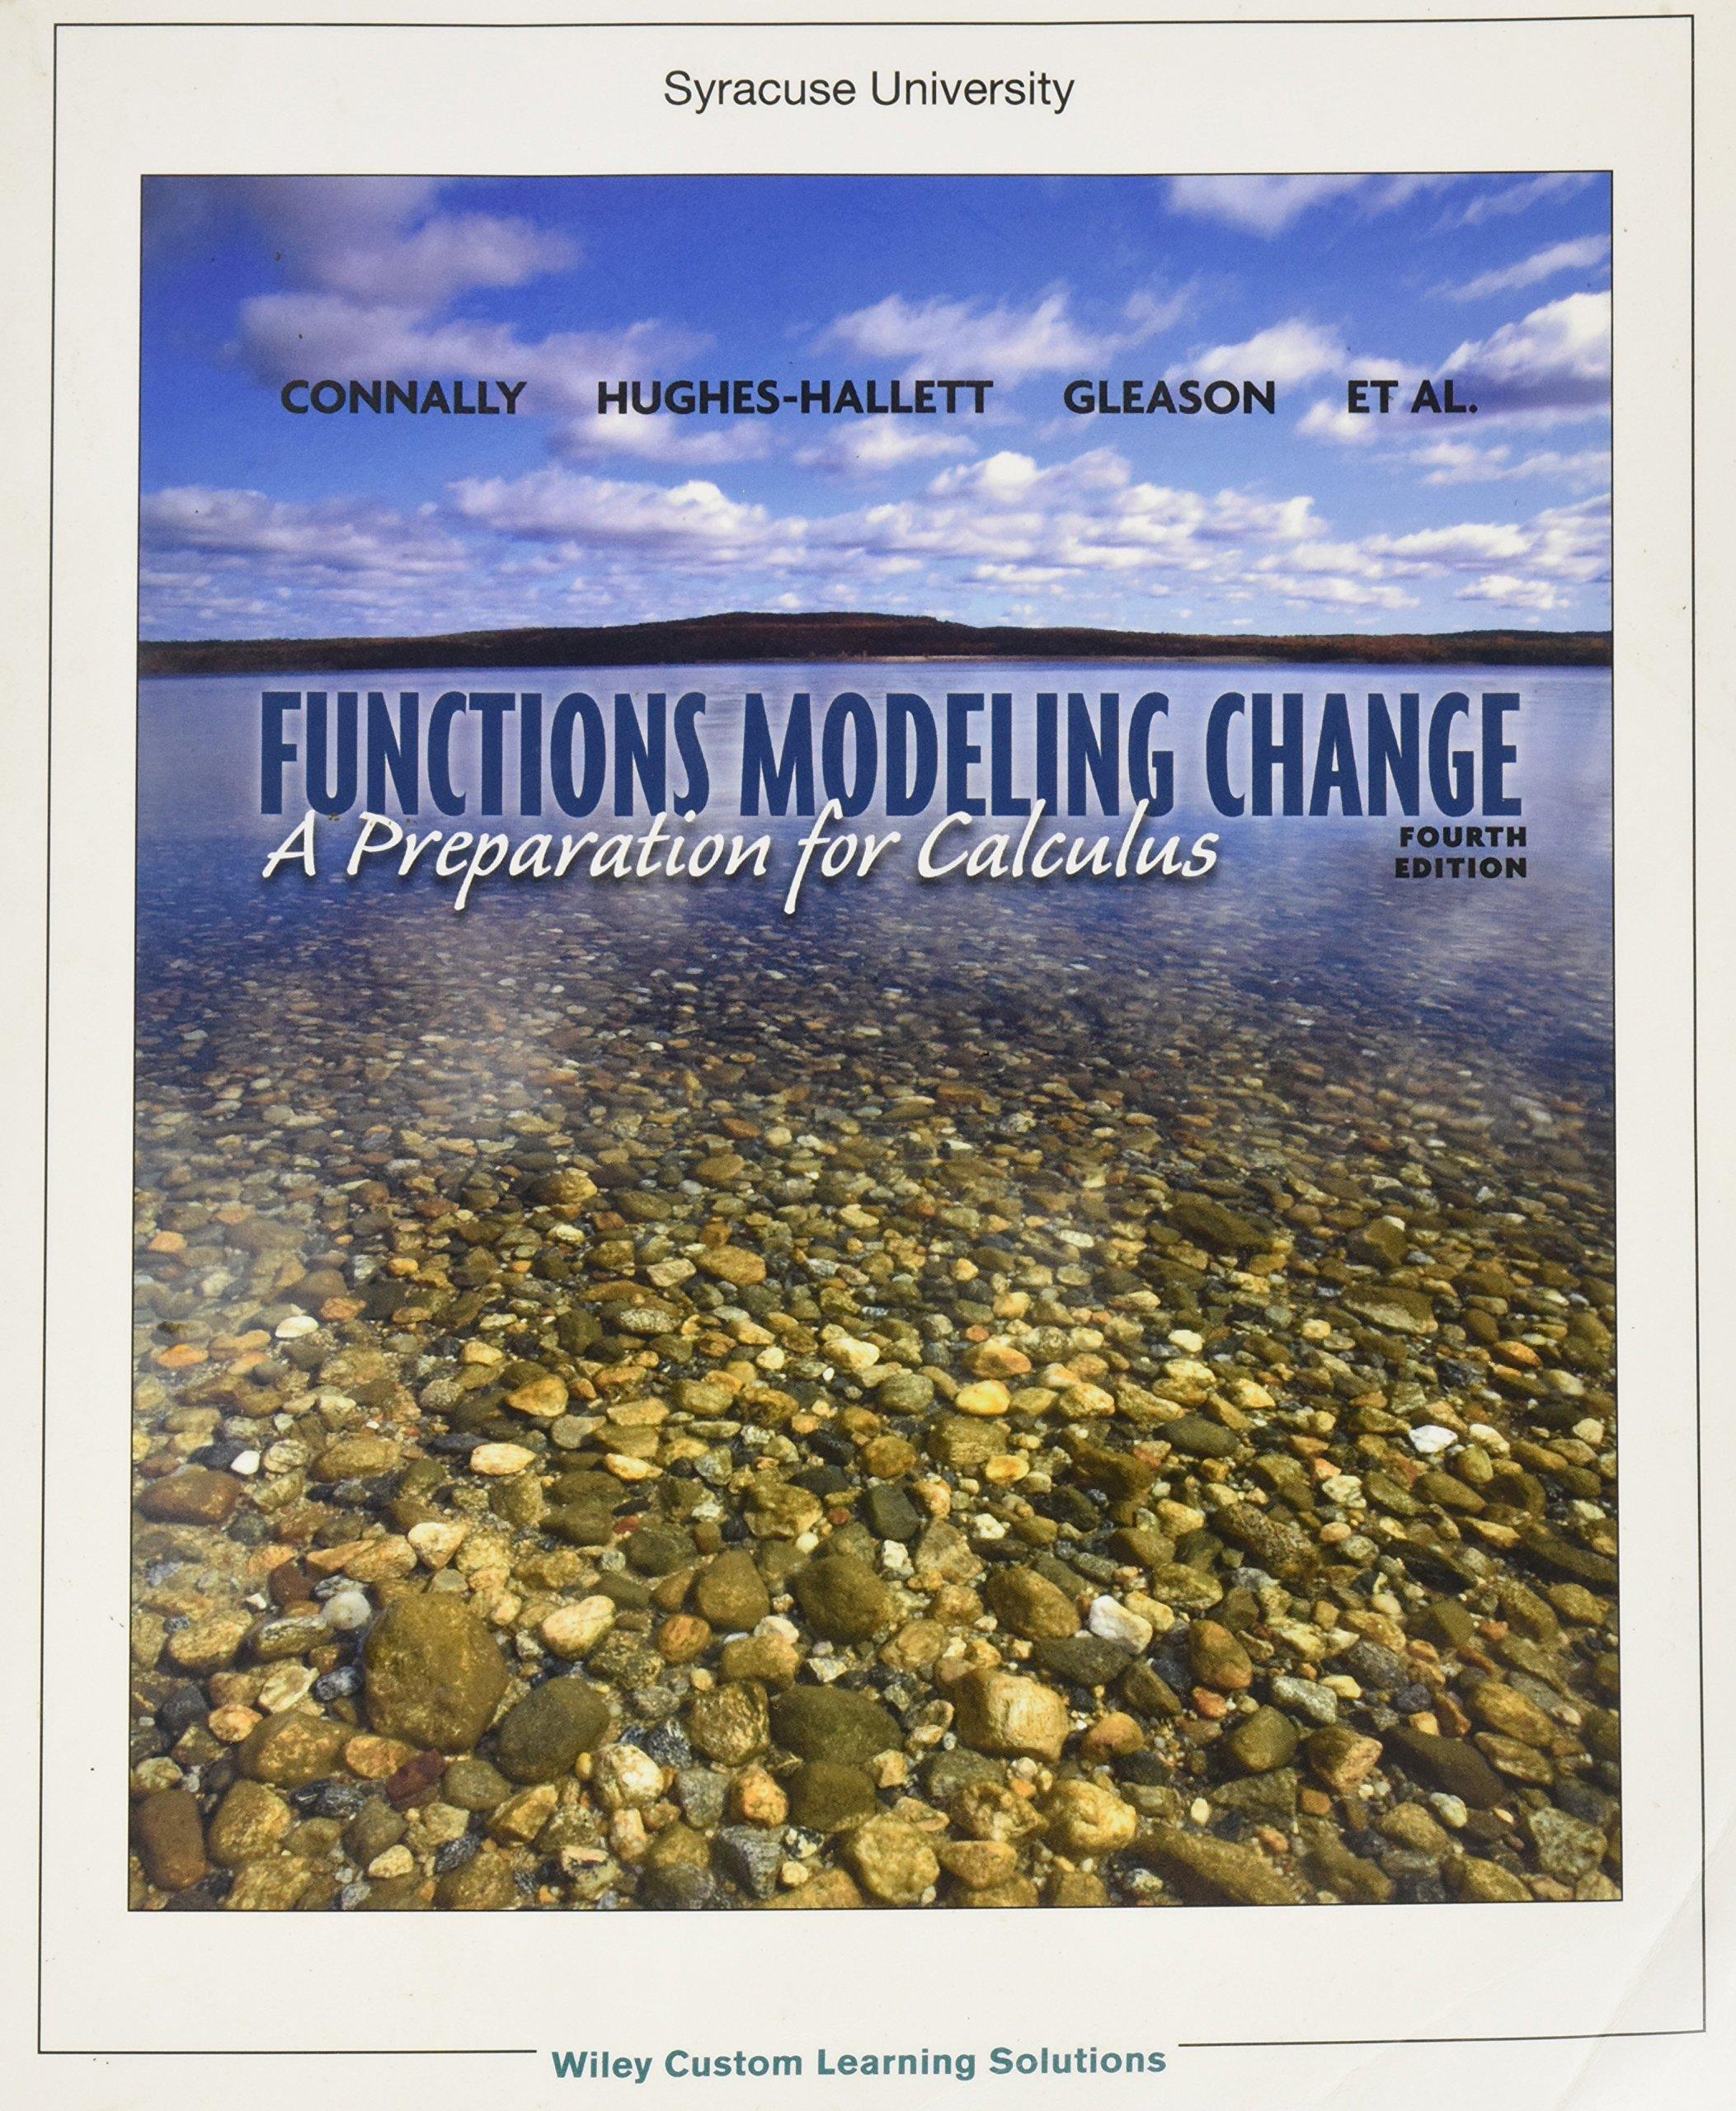 Functions Modeling Change, a Preparation for Calculus: Connally; Hughes- Hallett; Gleason; ET Al: 9781118127438: Amazon.com: Books